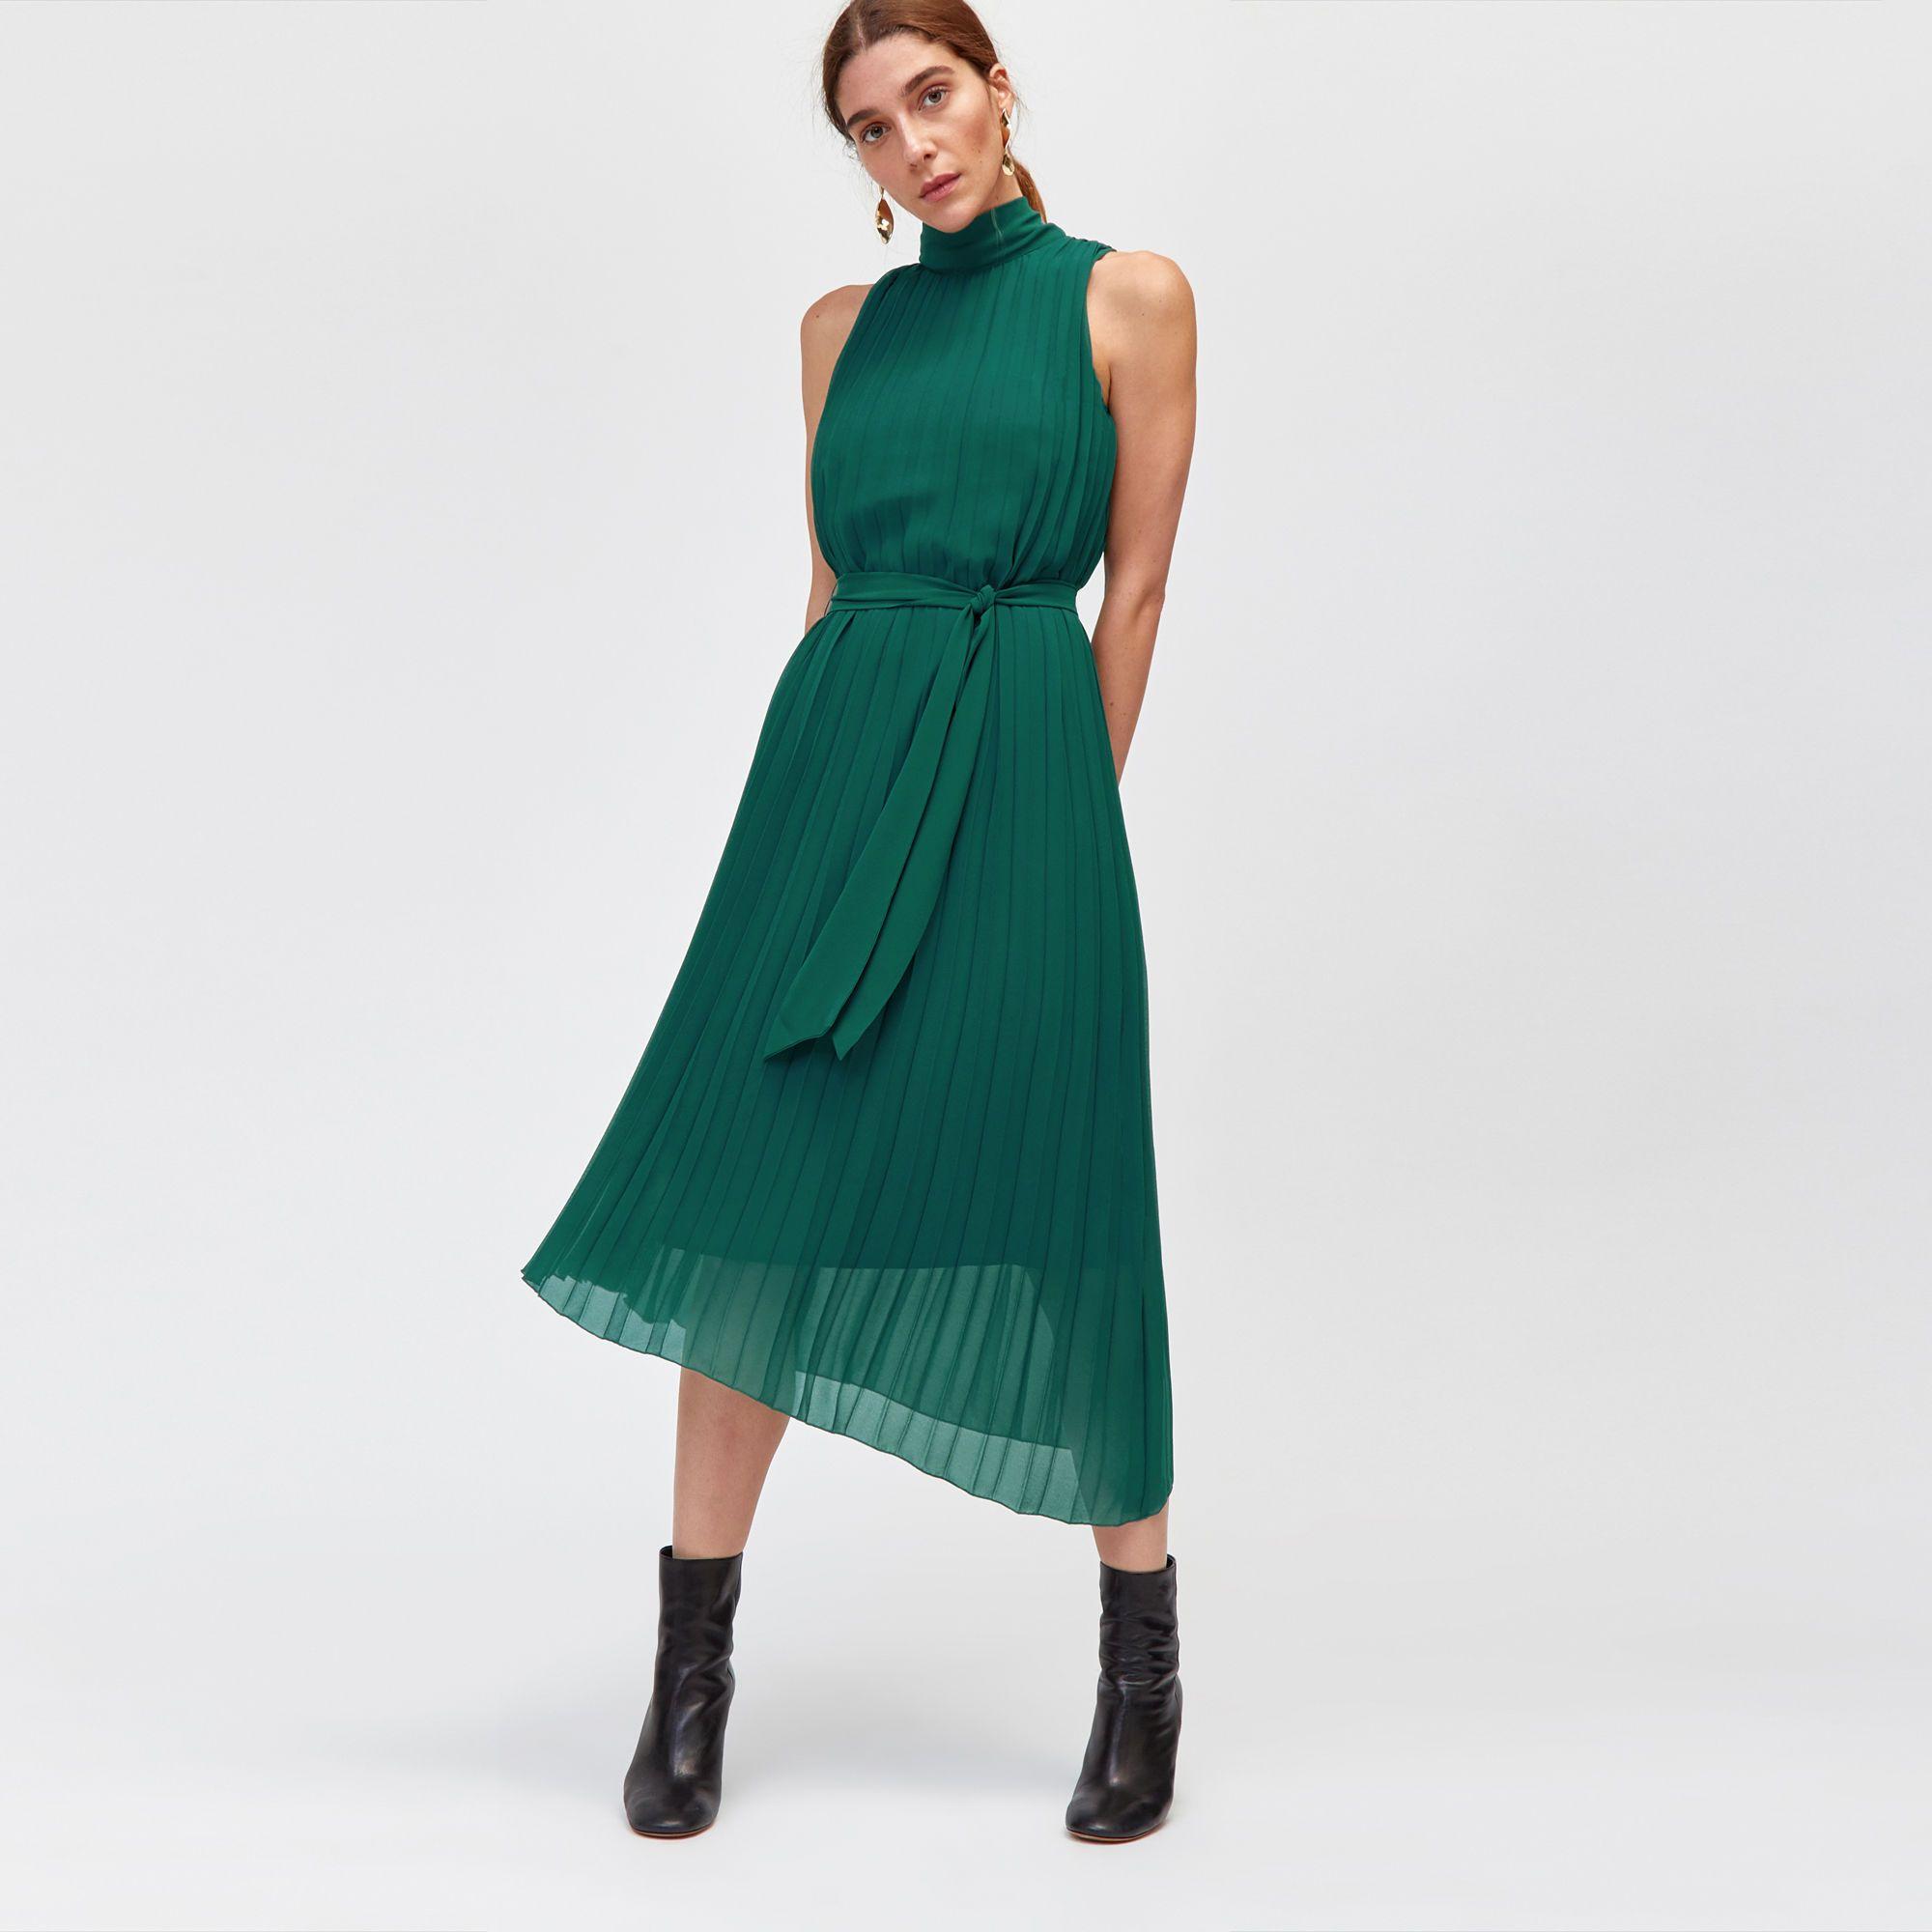 49cc87aa8c Pleated midi dress in 2019 | dresses | Pleated midi dress, Dresses ...